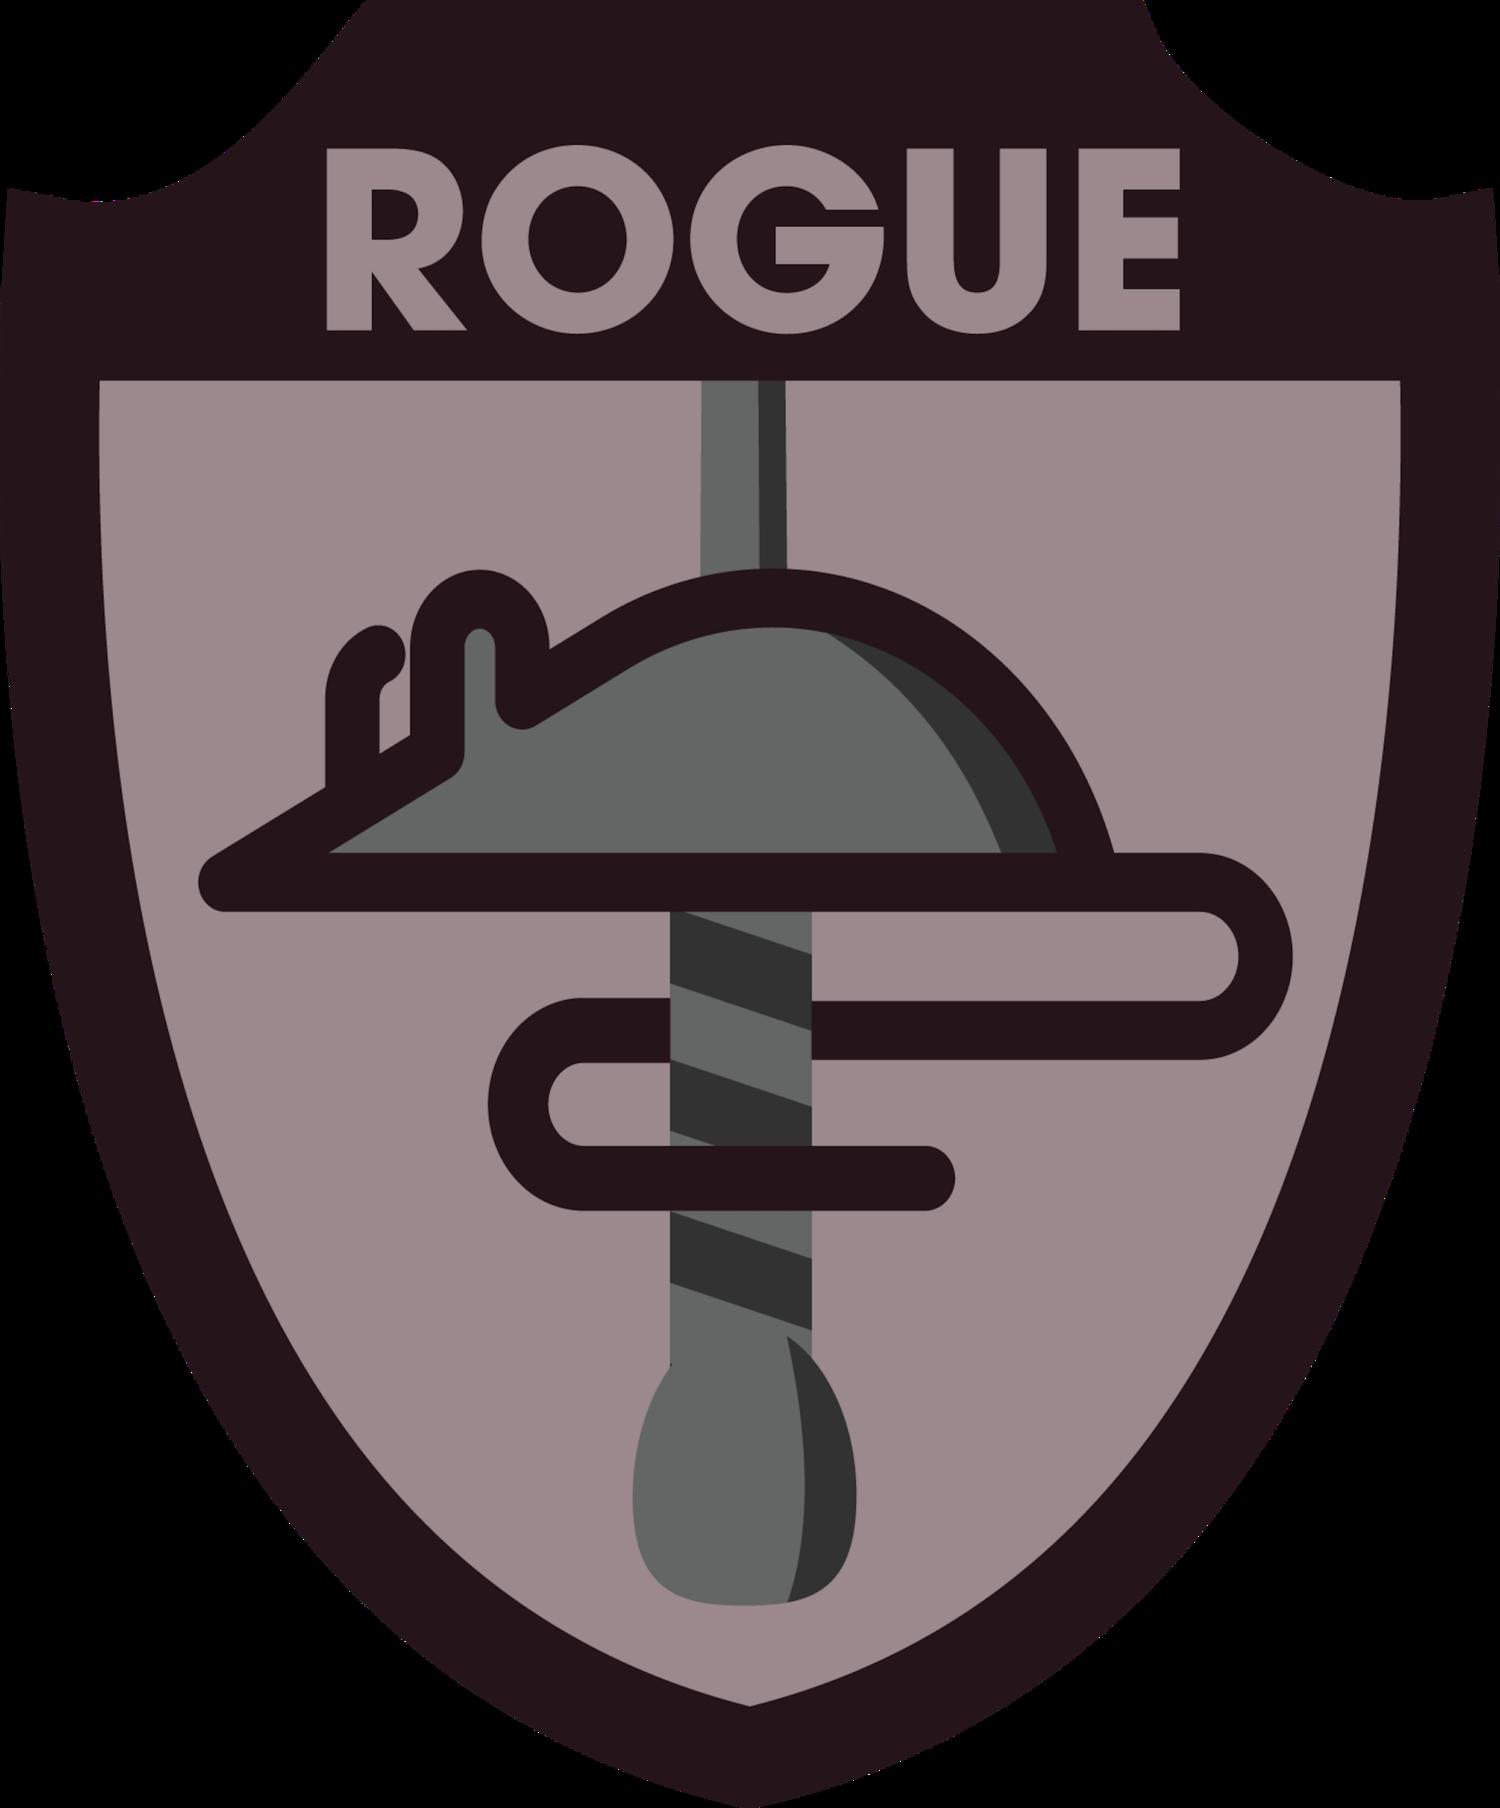 Riposte Harlem — Rogue Fencing.